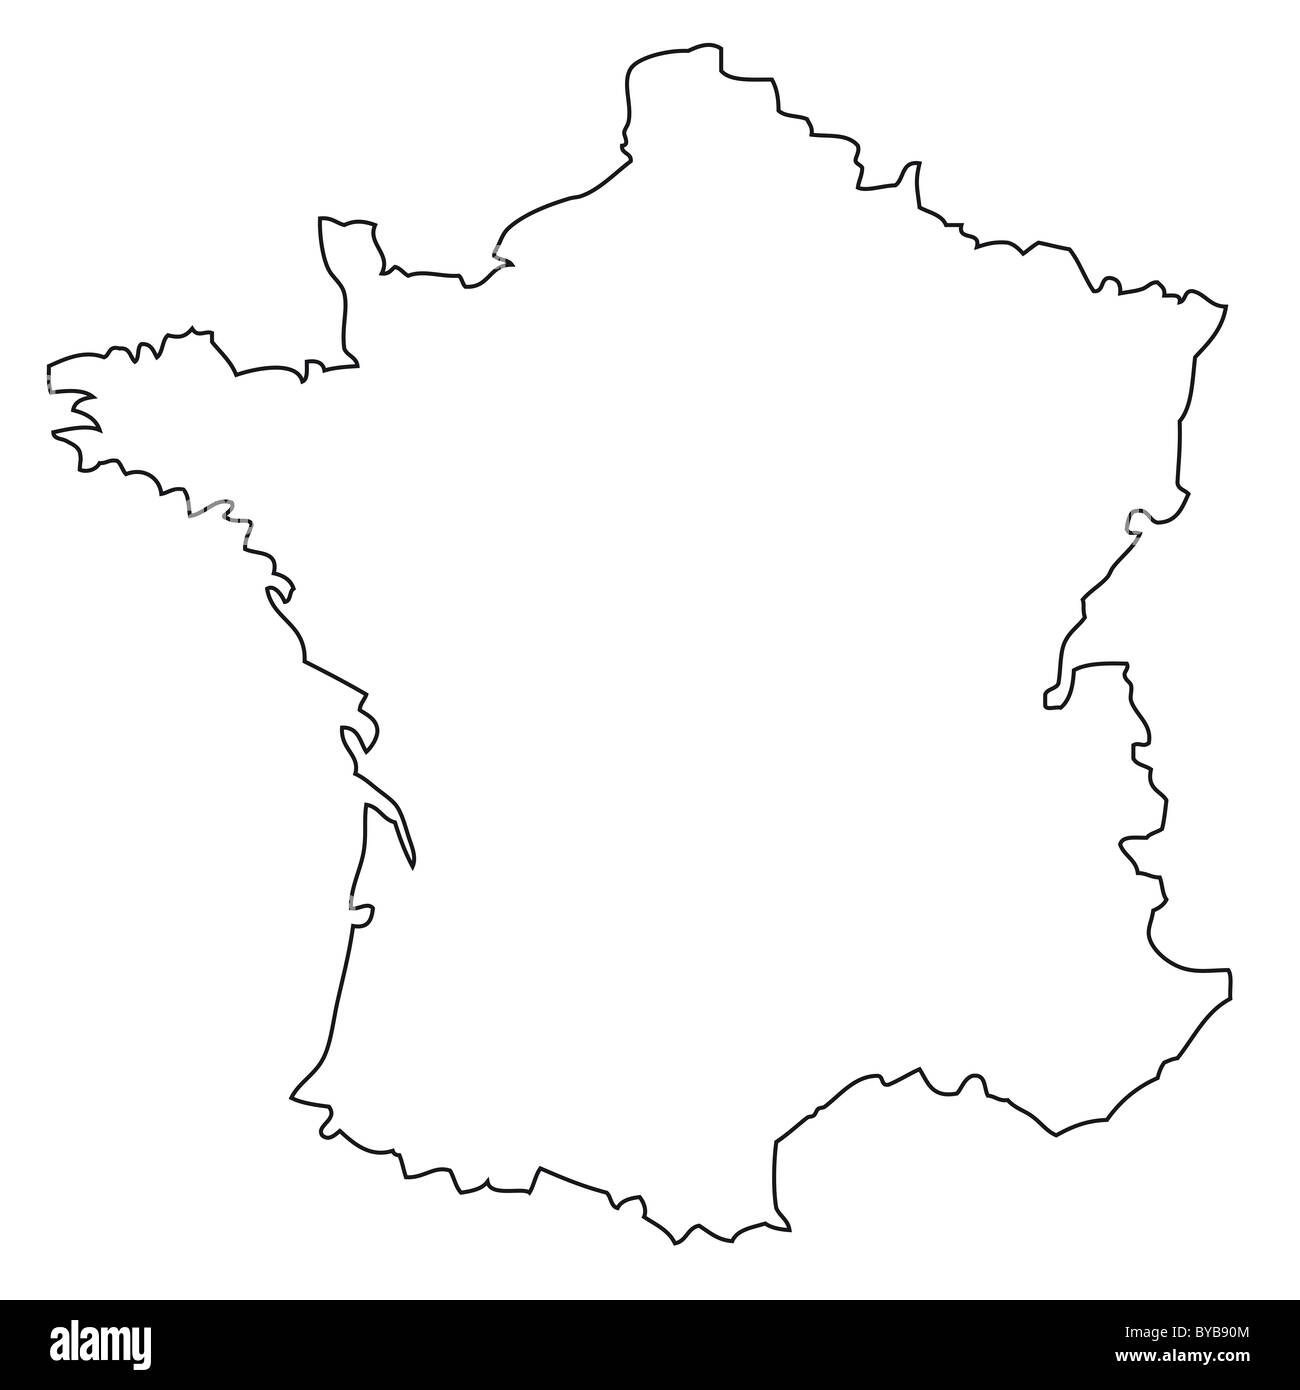 Outline Of Map Of France.Outline Map Of France Stock Photo 34054628 Alamy